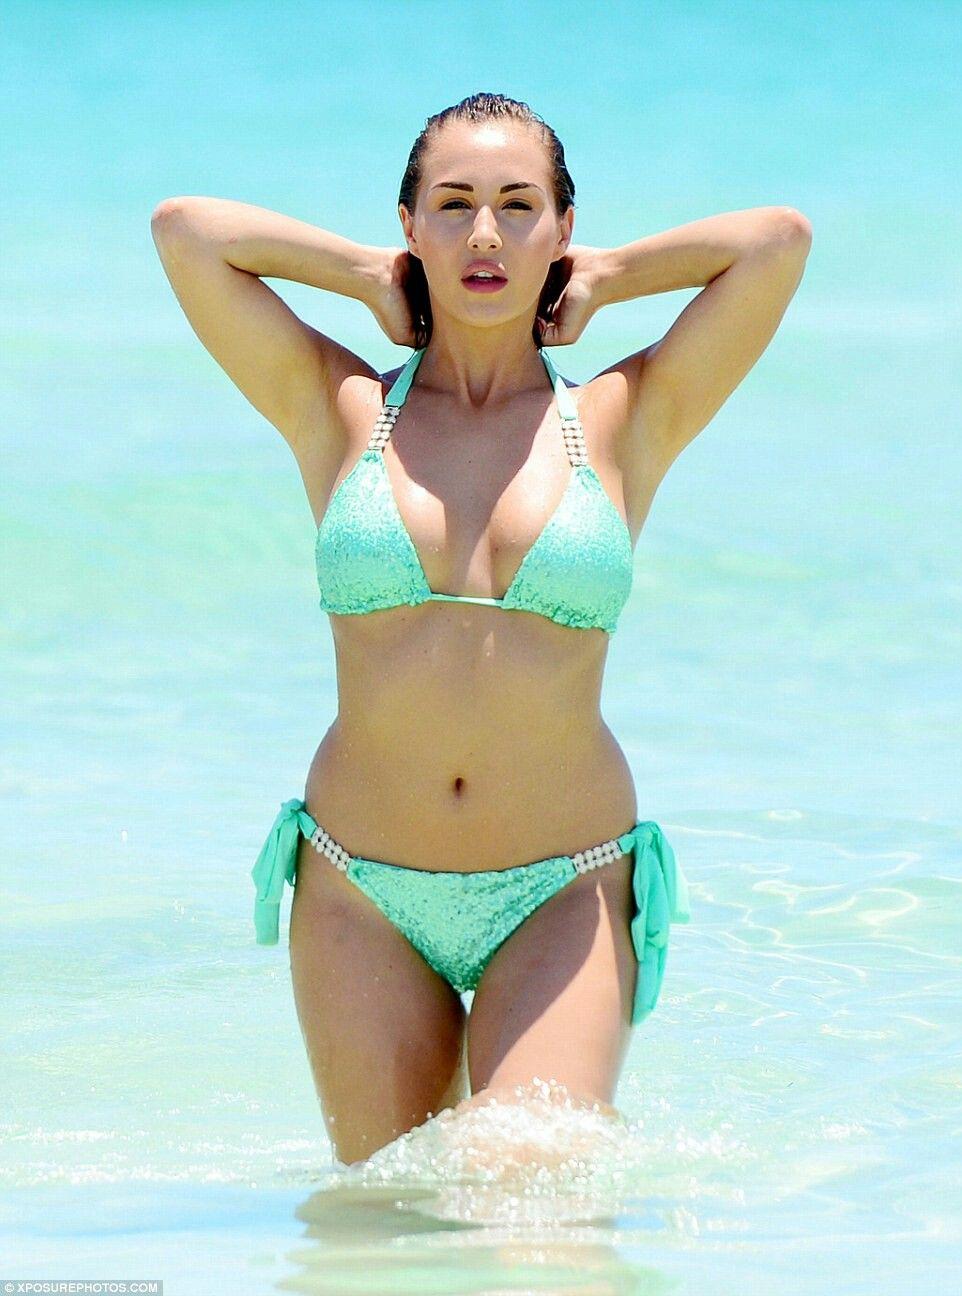 Inez Busty Ele pinnoor on actress in bikini   pinterest   girlfriends and